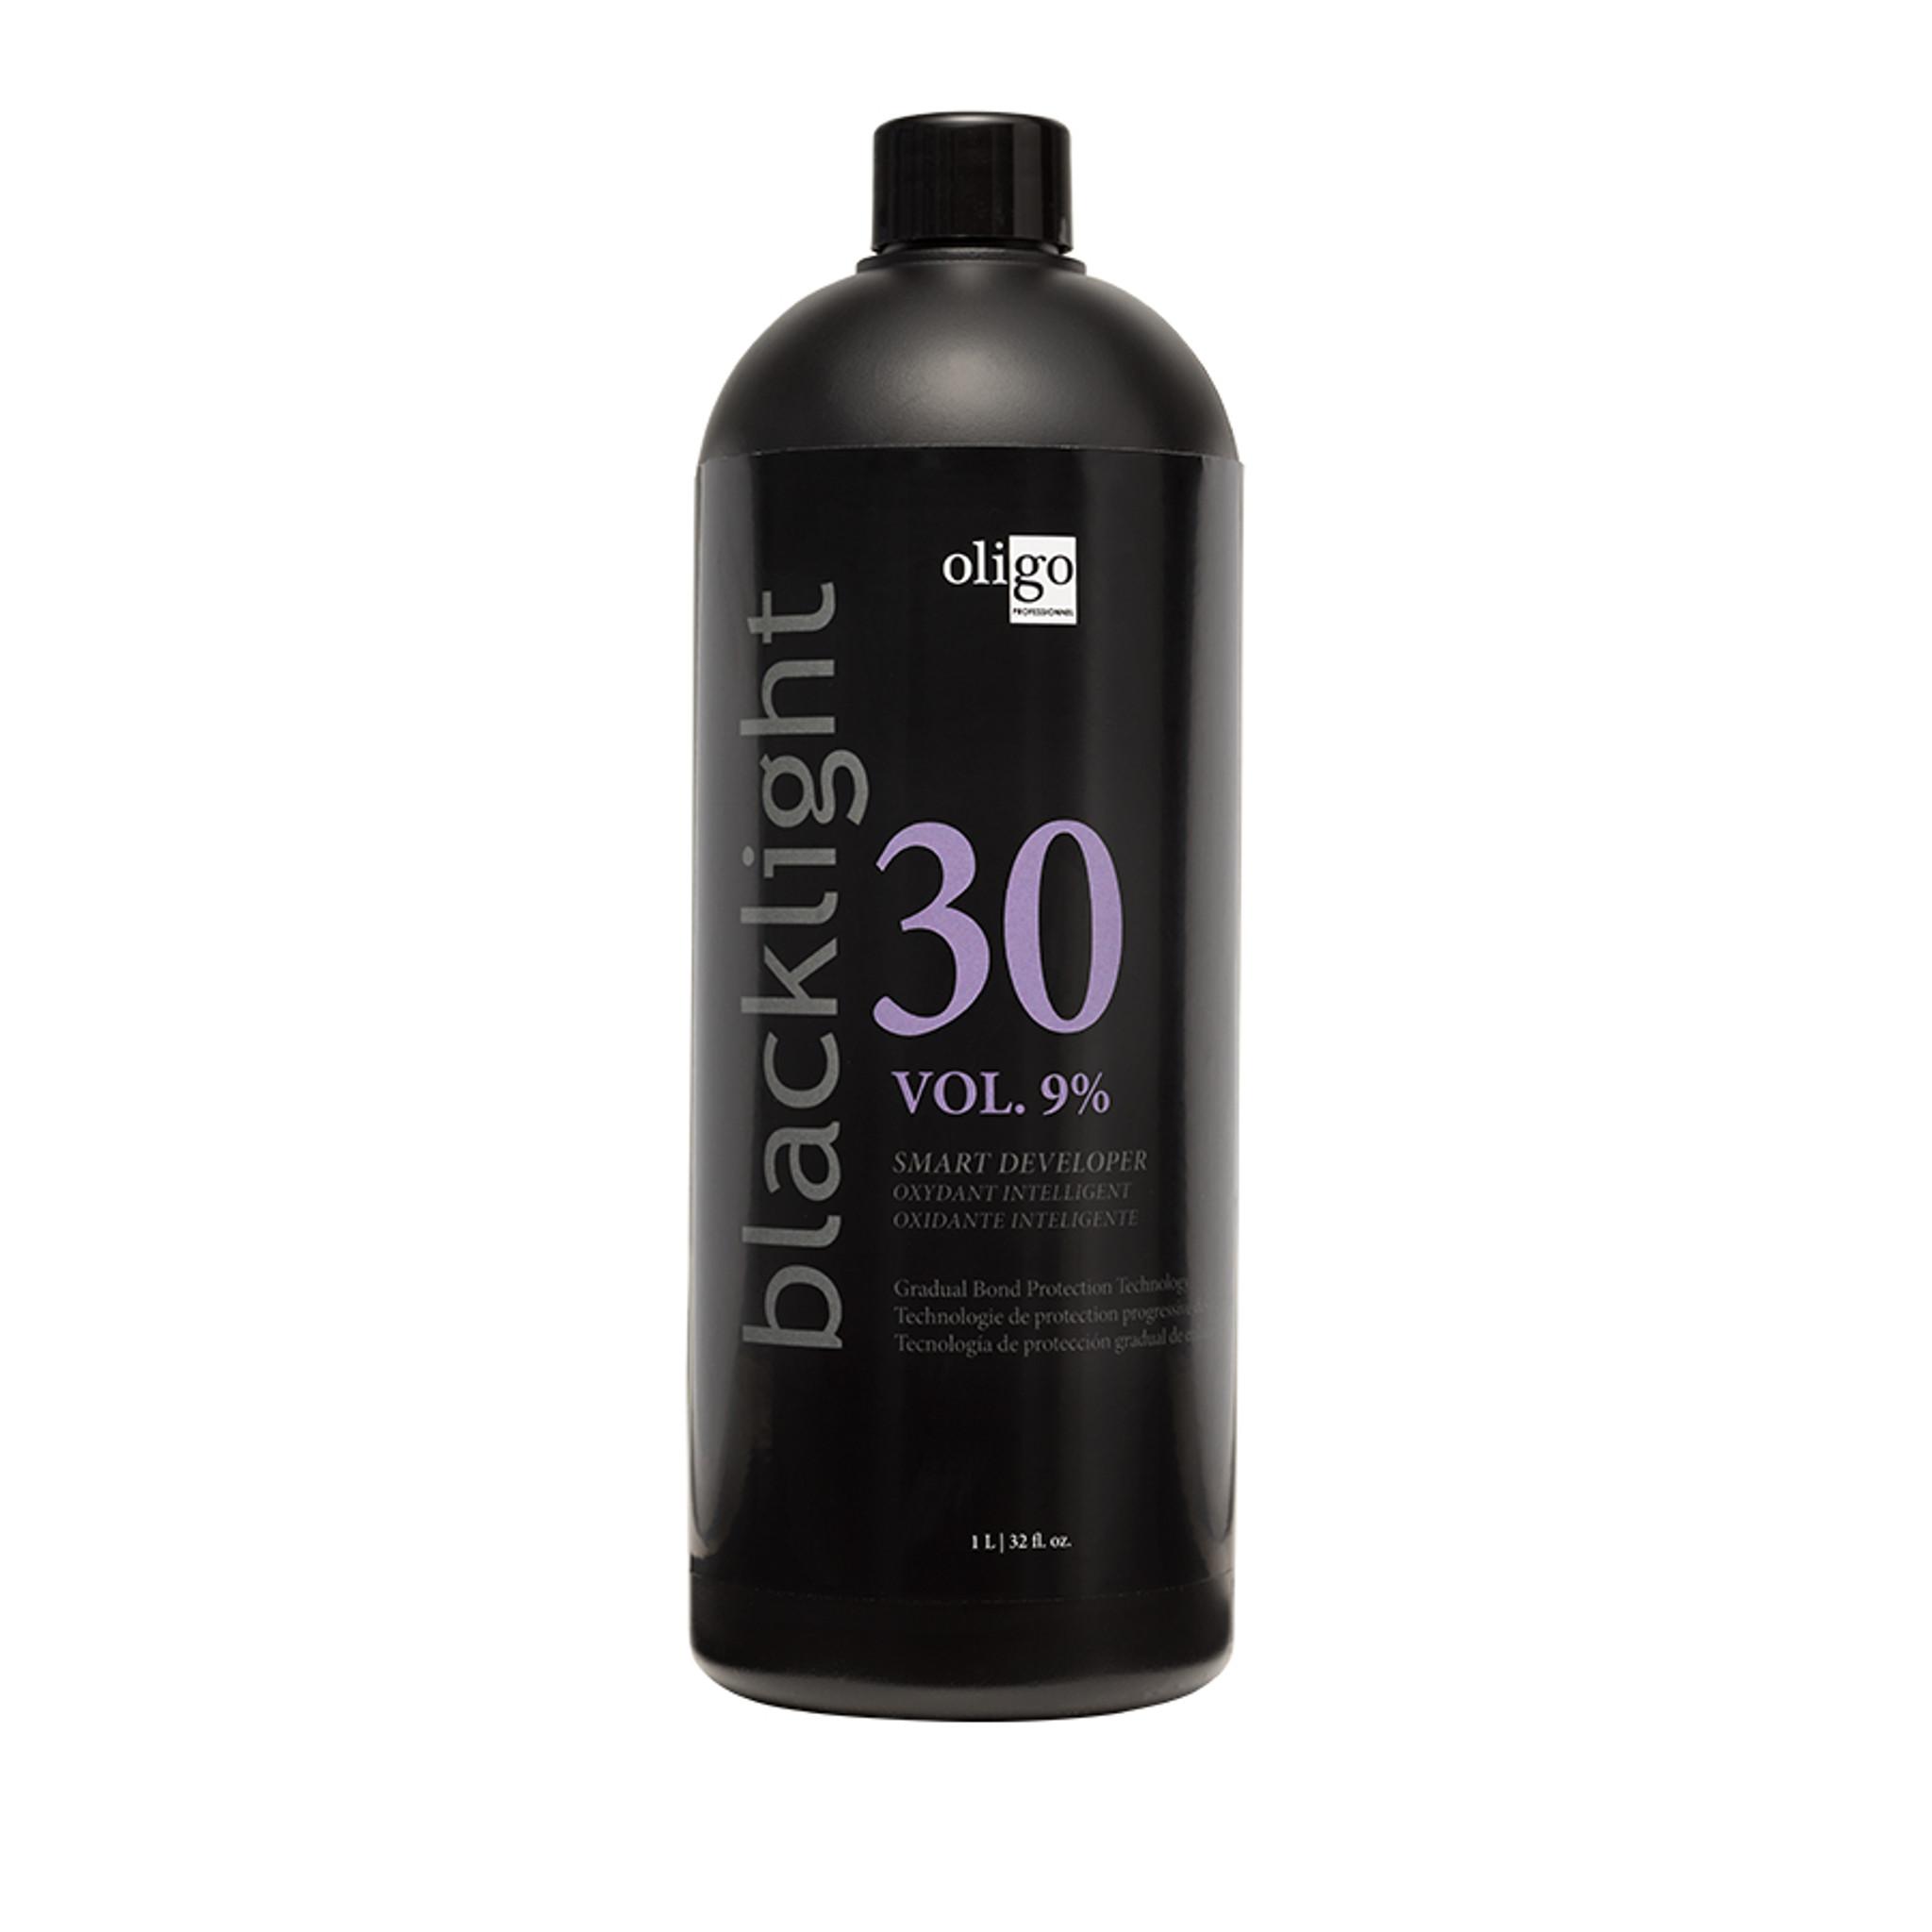 Oligo Pro Blacklight 30 Vol (9%) Smart Developer 1lt by Shop Salon Support - official distributor of Oligo in Australia, Hair & Barber Barbershop Trade Wholesale Hairdressing Supplies Melbourne Australia